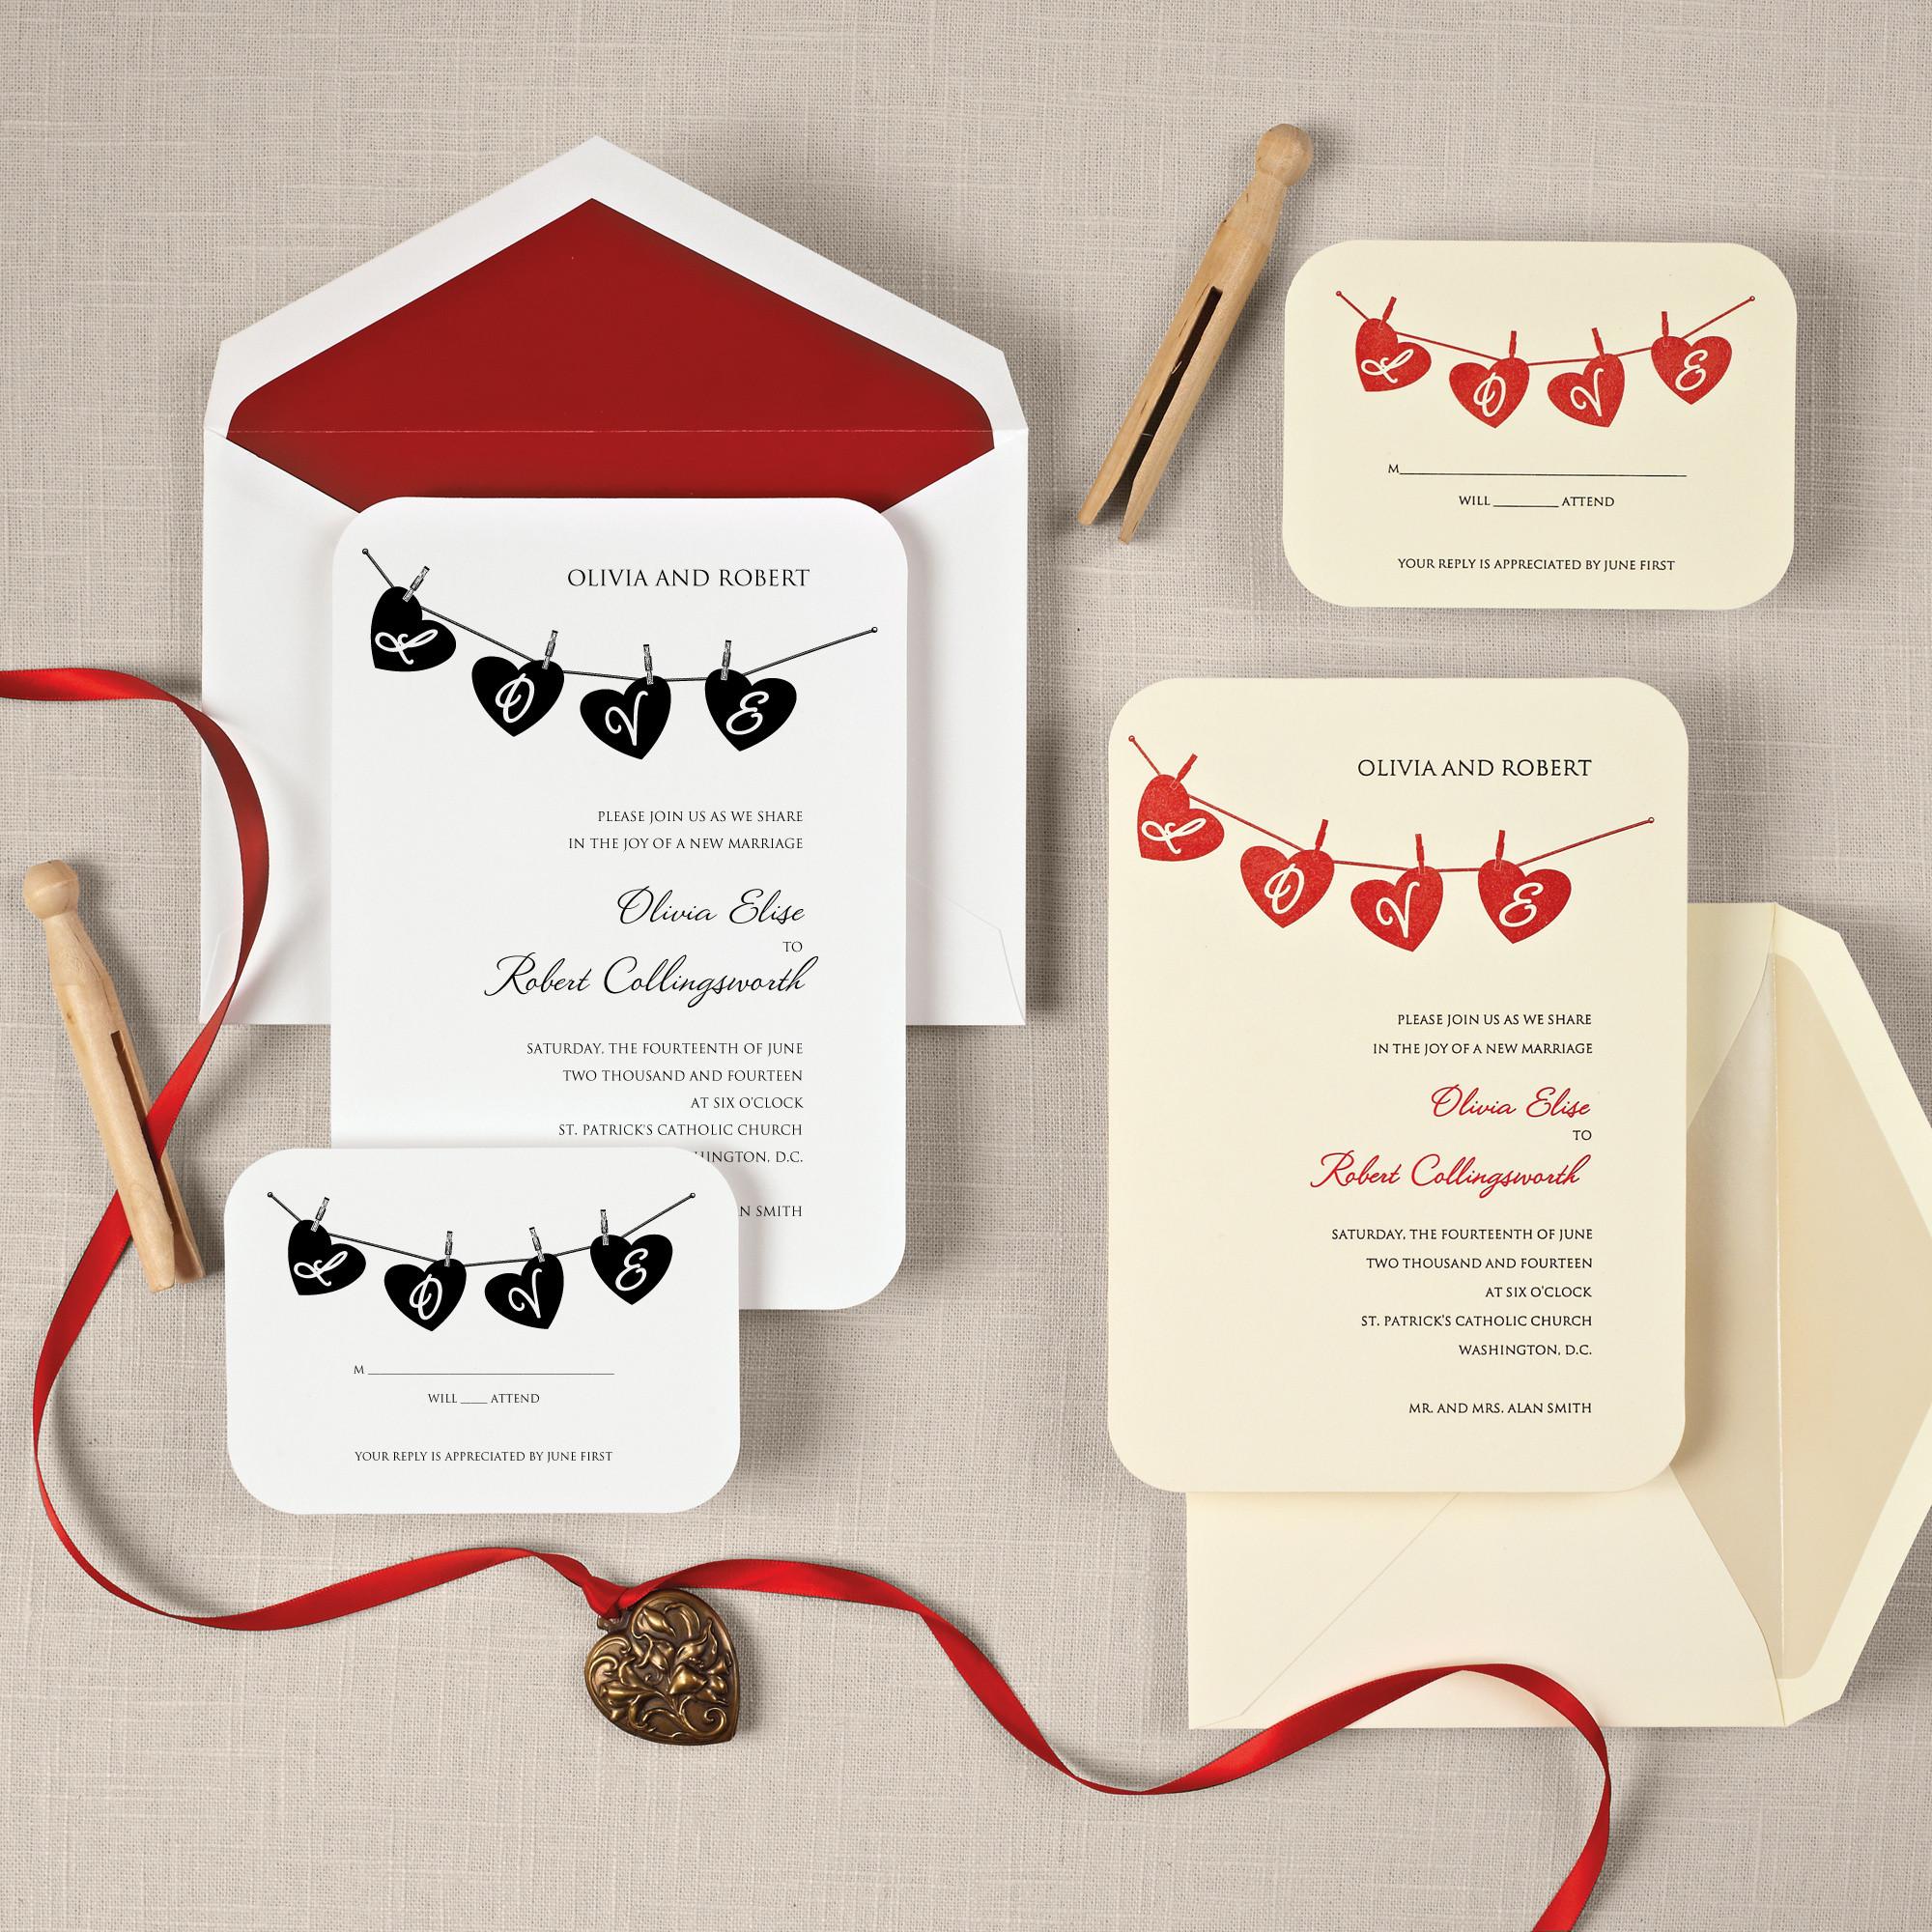 hung up on love wedding invitation heart wedding invitations - Cute Wedding Invitations